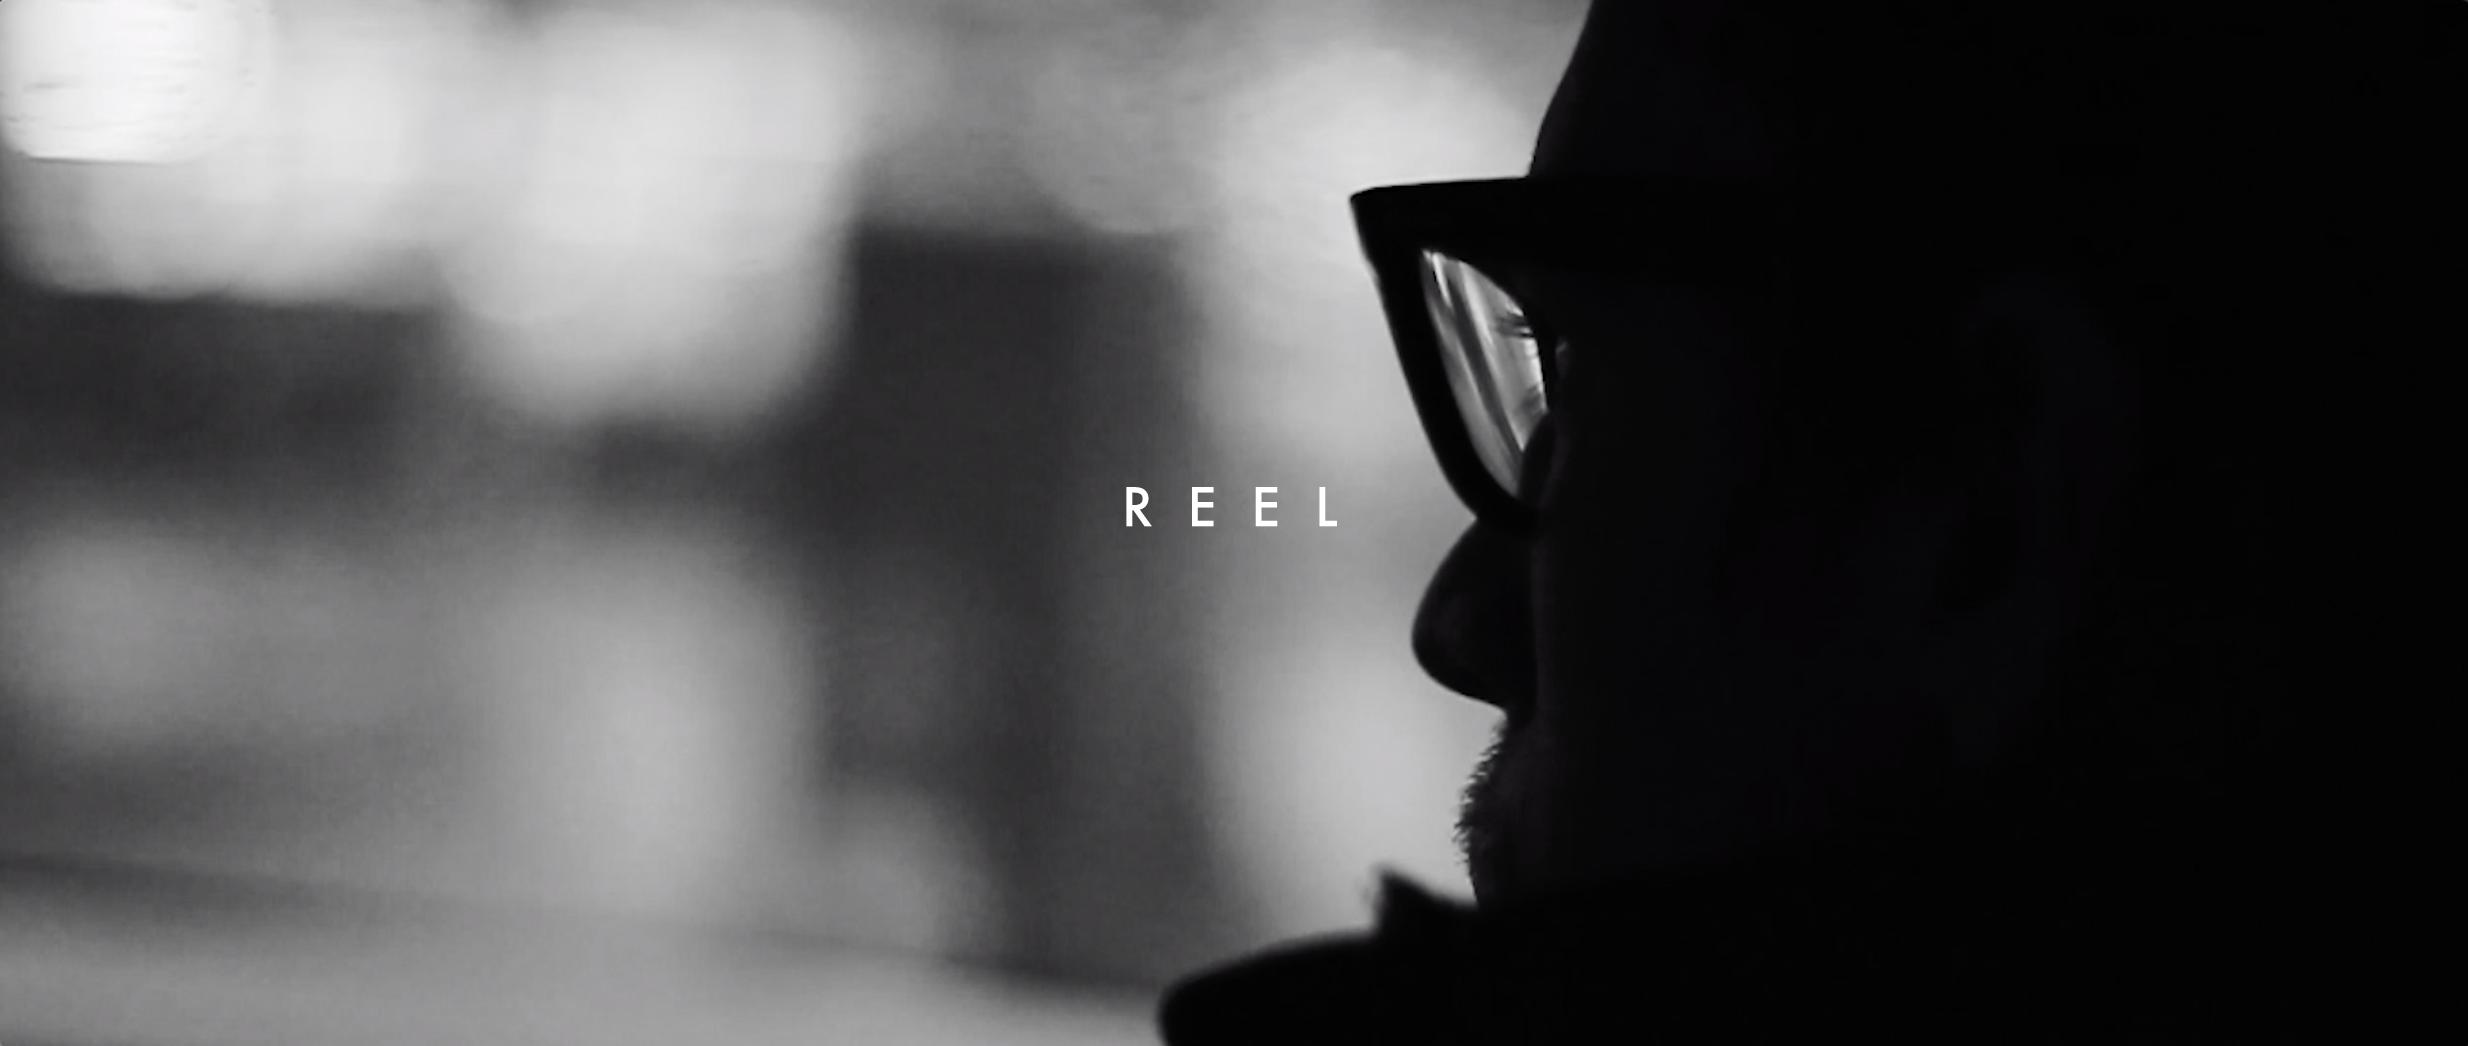 reel_thumb.png